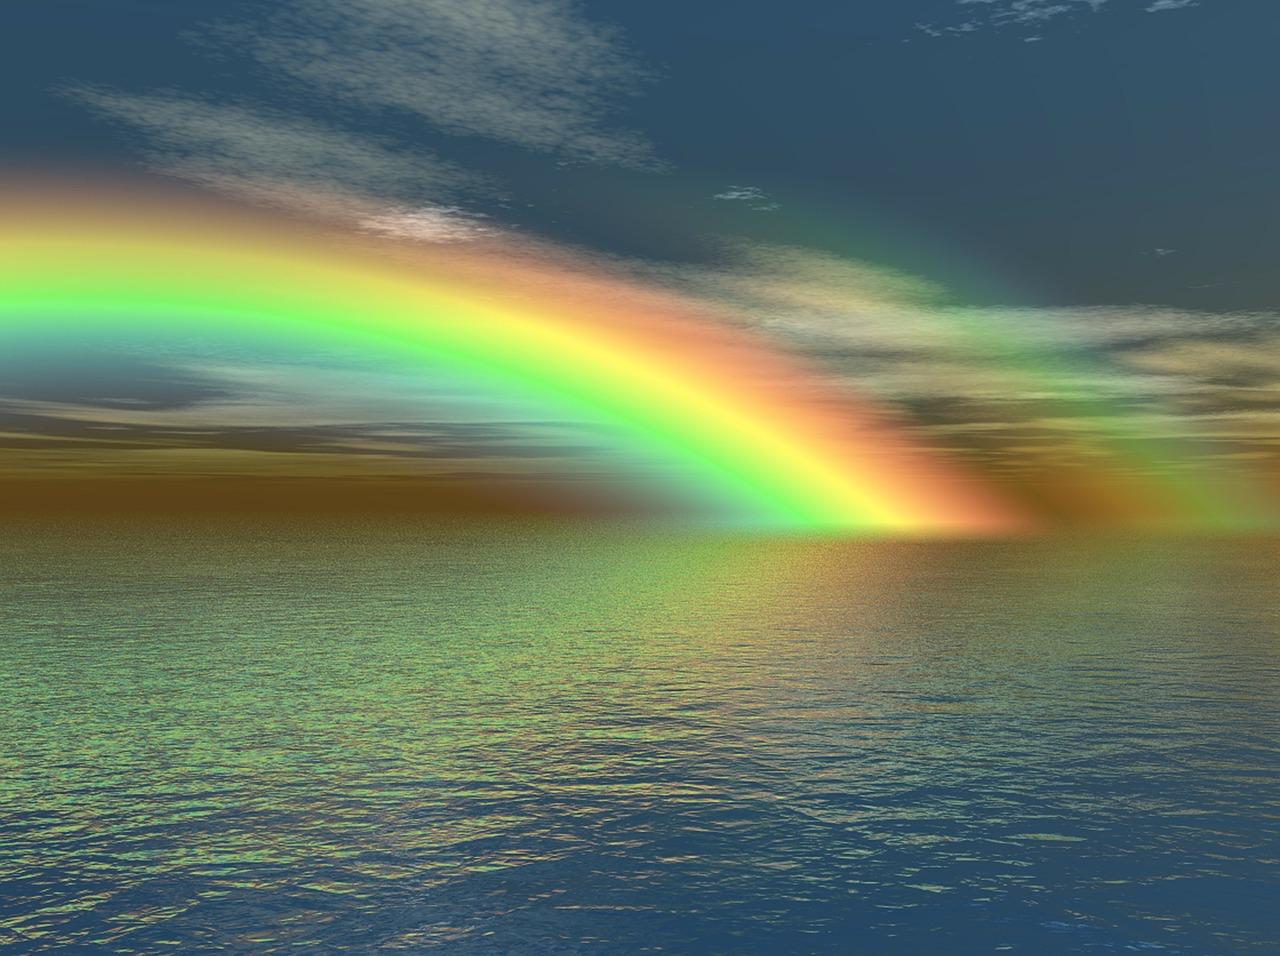 rainbow-67902_1280 pixabay